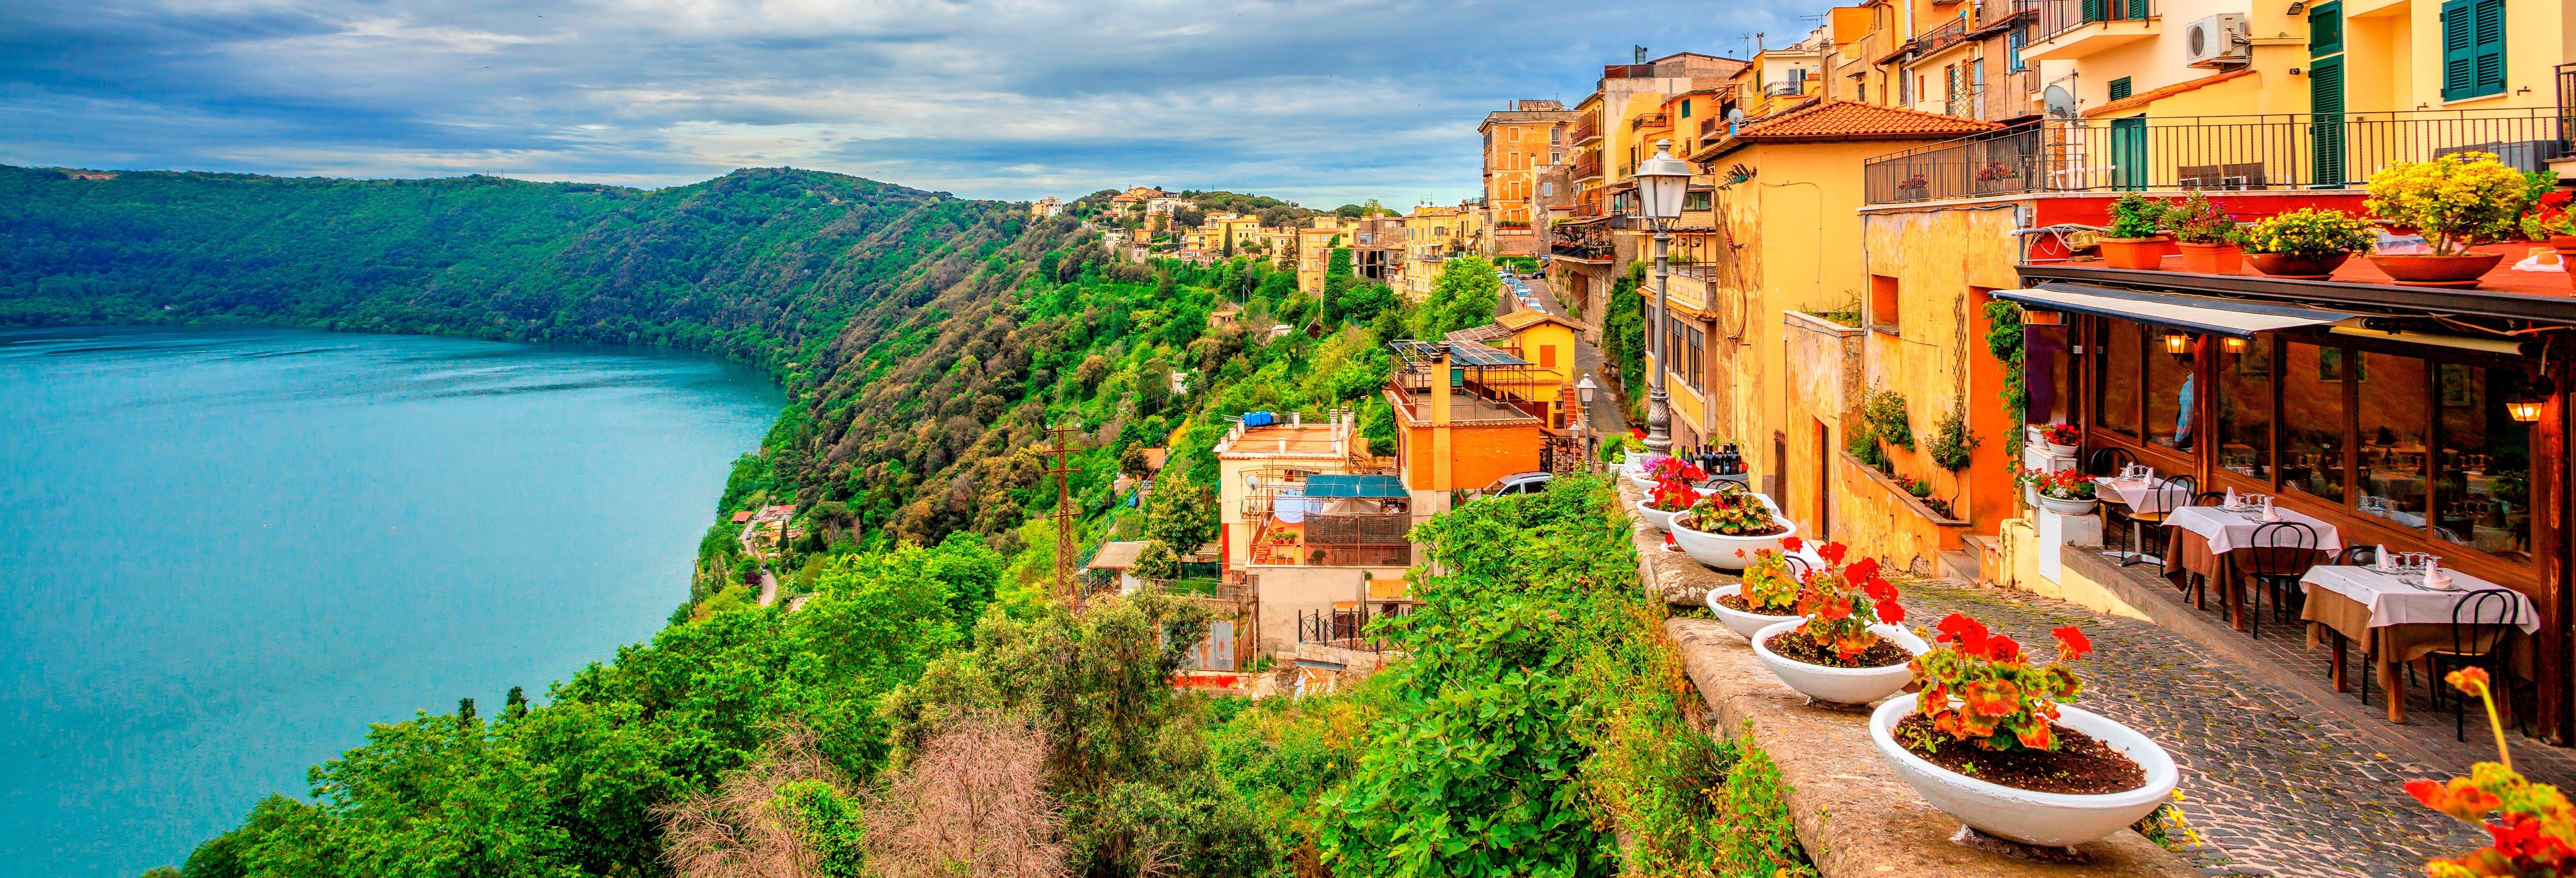 Tour privado por Castelli Romani